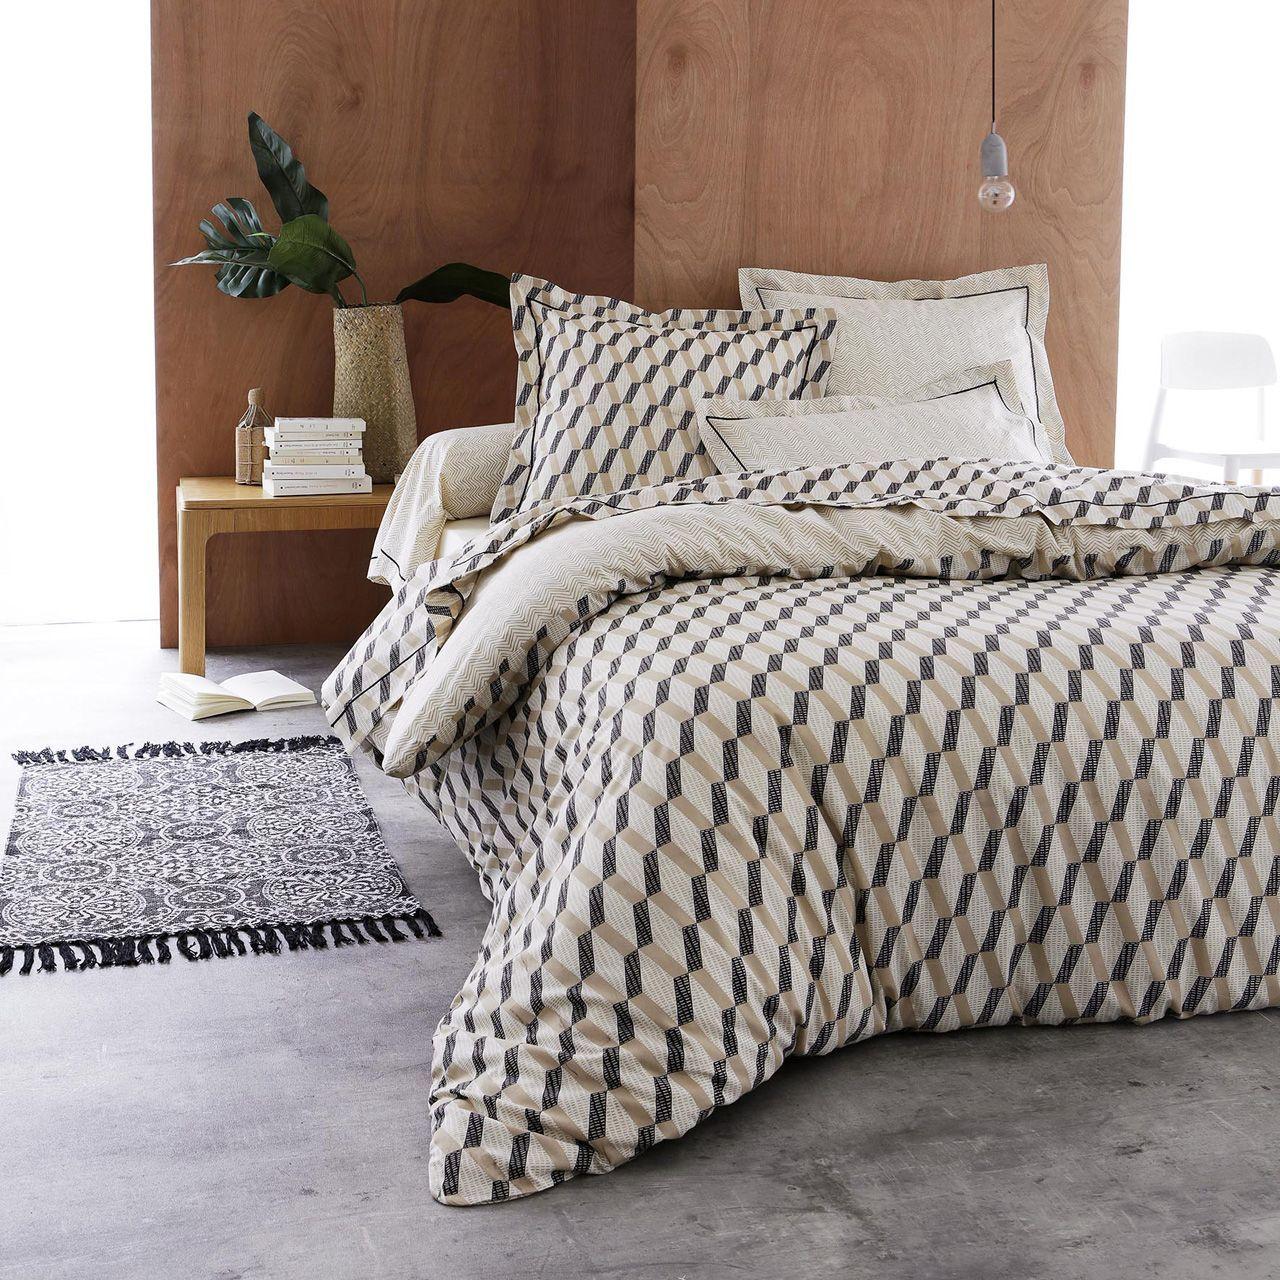 drap plat eko coton imprim losange 180x290 tradilinge. Black Bedroom Furniture Sets. Home Design Ideas